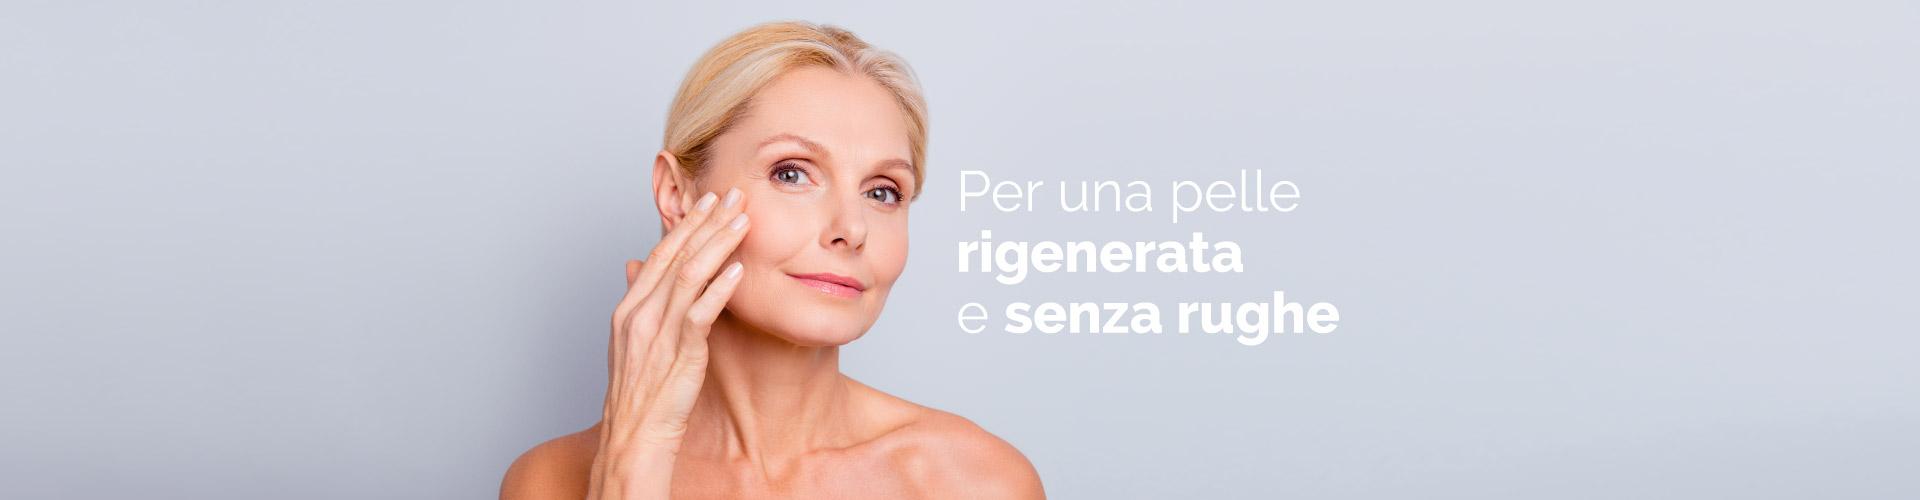 Trattamenti antirughe - 3C Salute Reggio Emilia